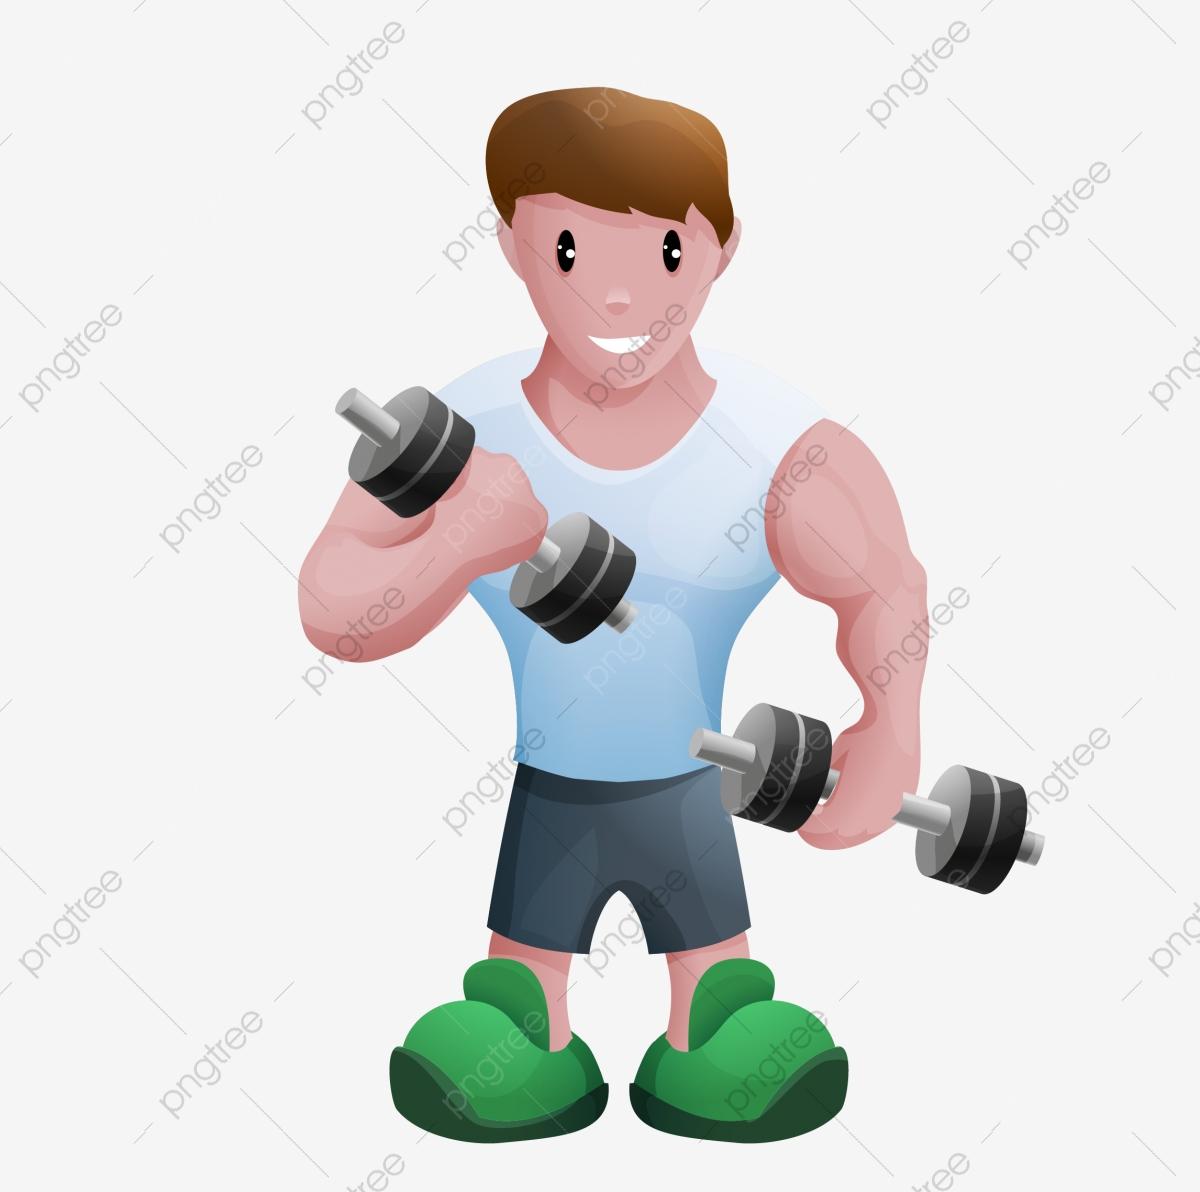 Gym clipart gym boy. Motion fitness equipment cartoon